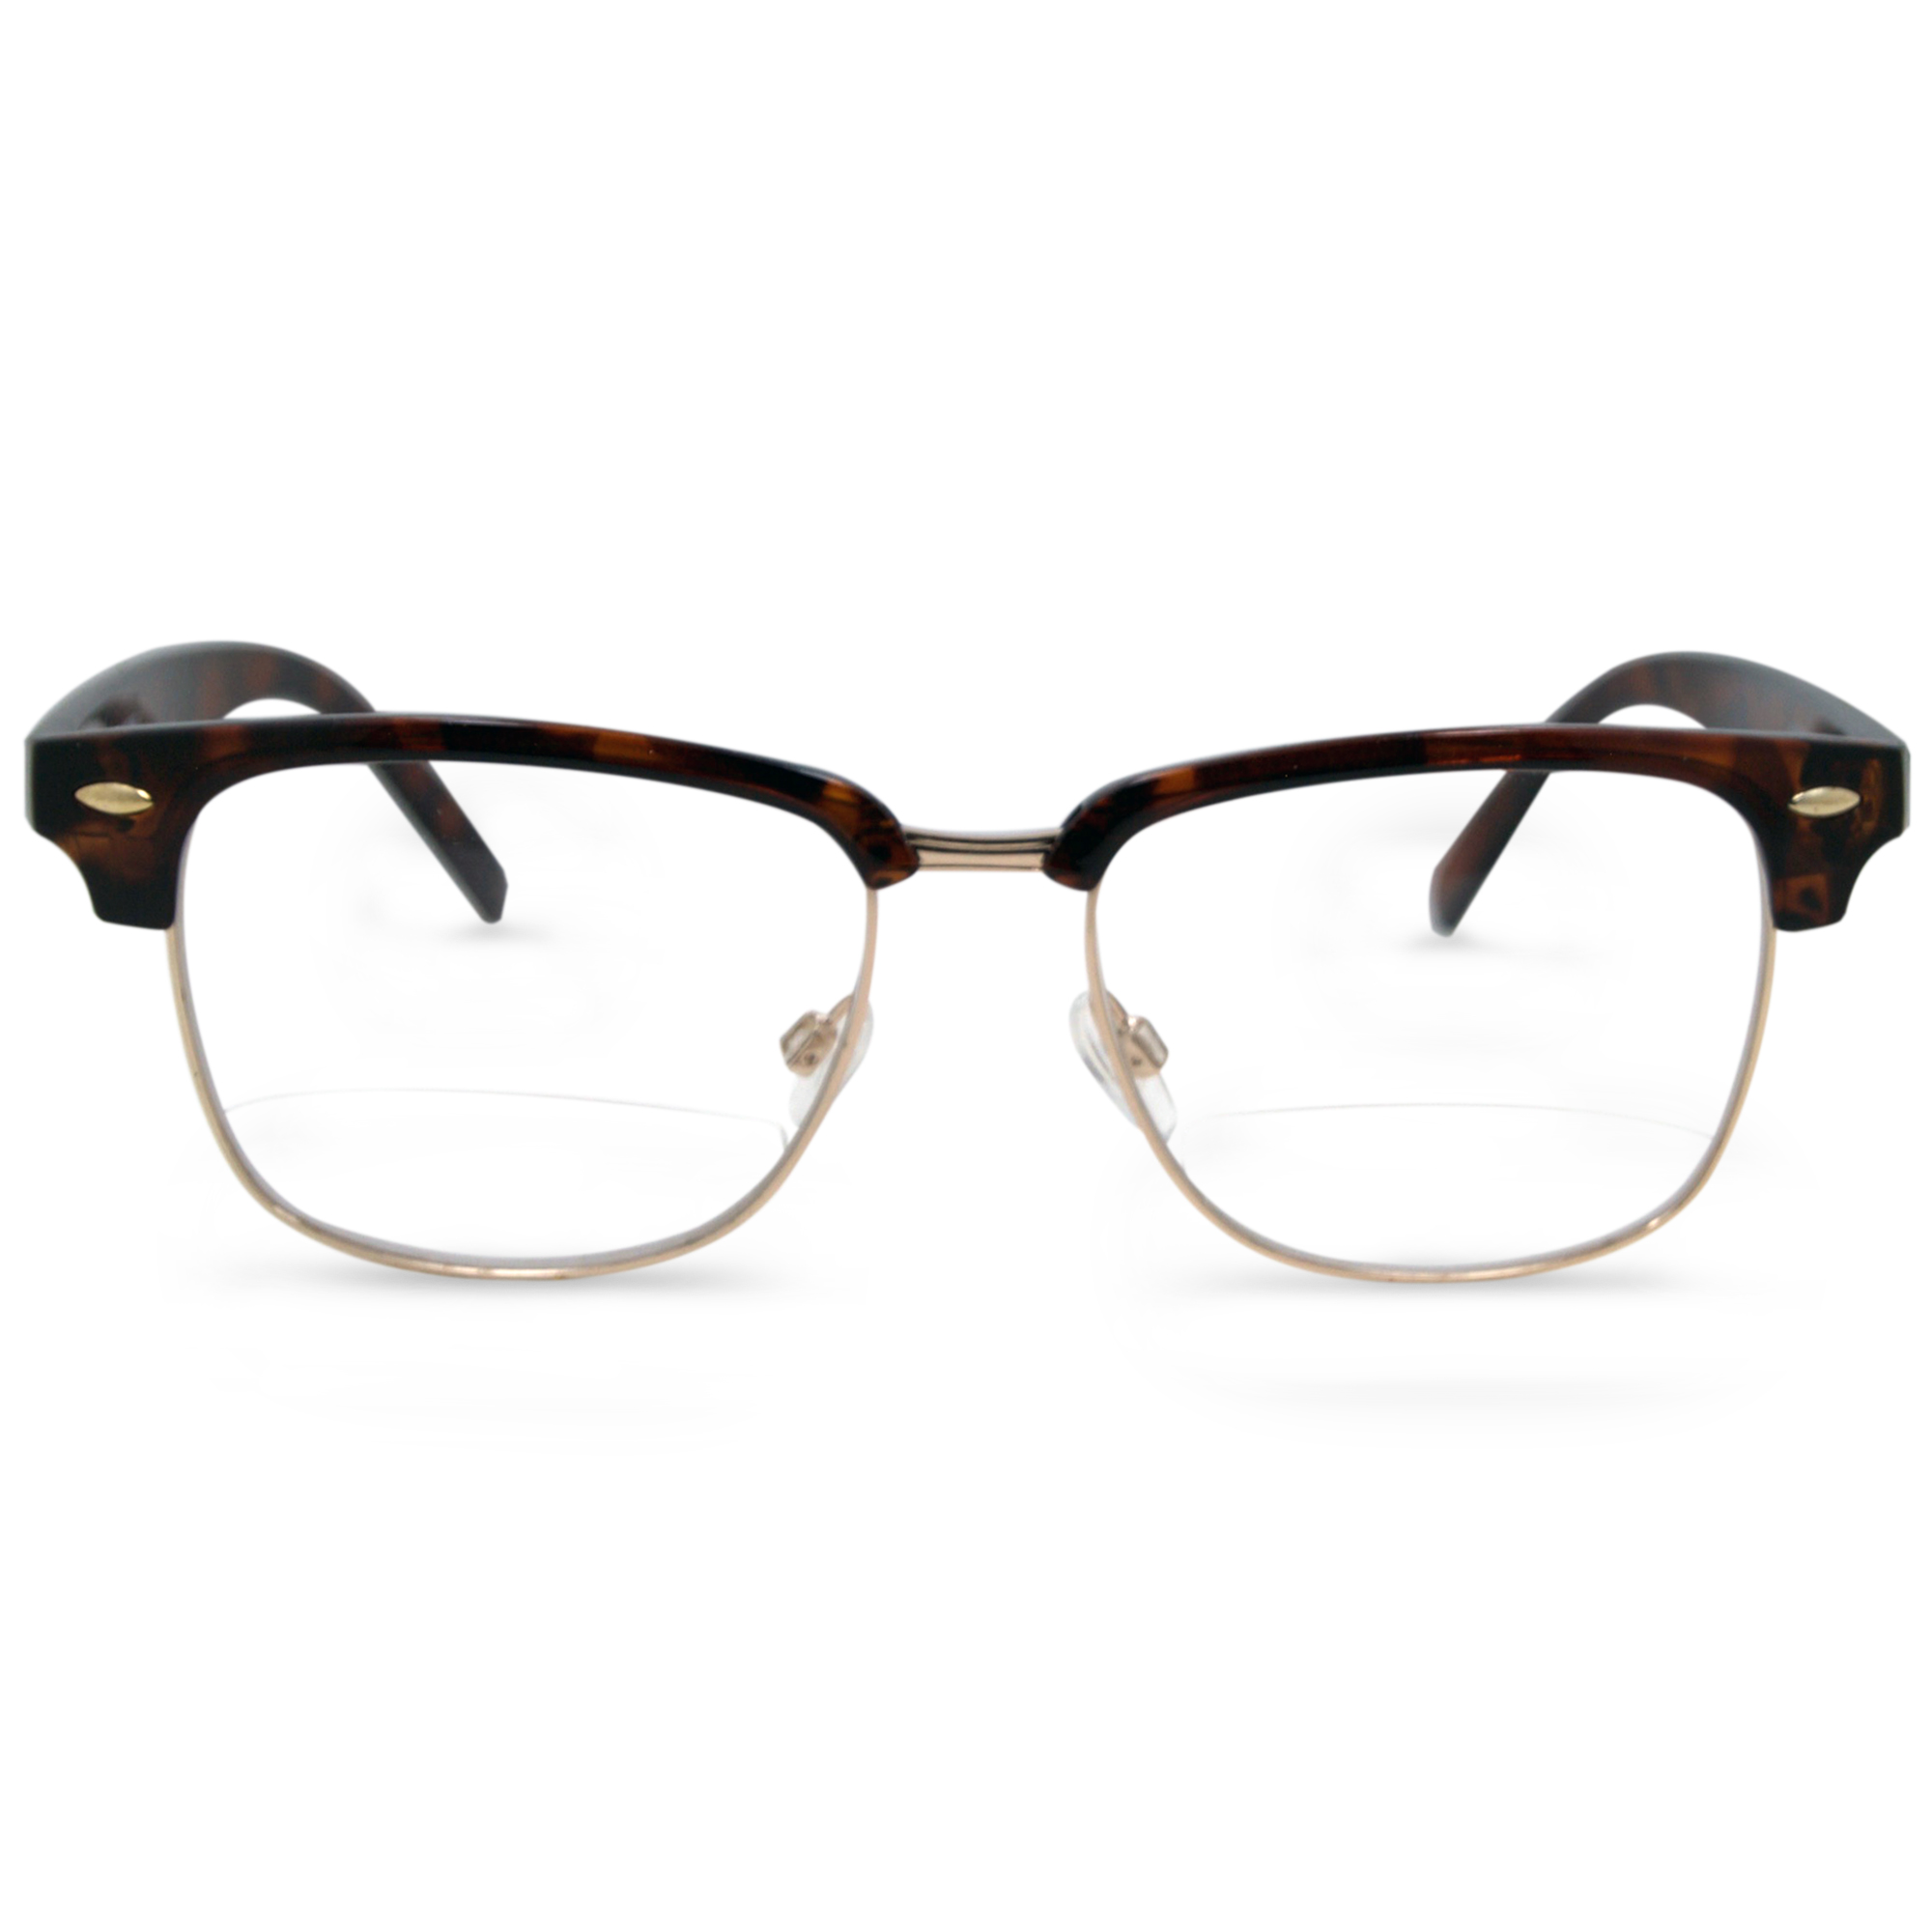 486fc8a9bf In Style Eyes Sellecks Bifocal Reading Glasses for Both Men   Women ...